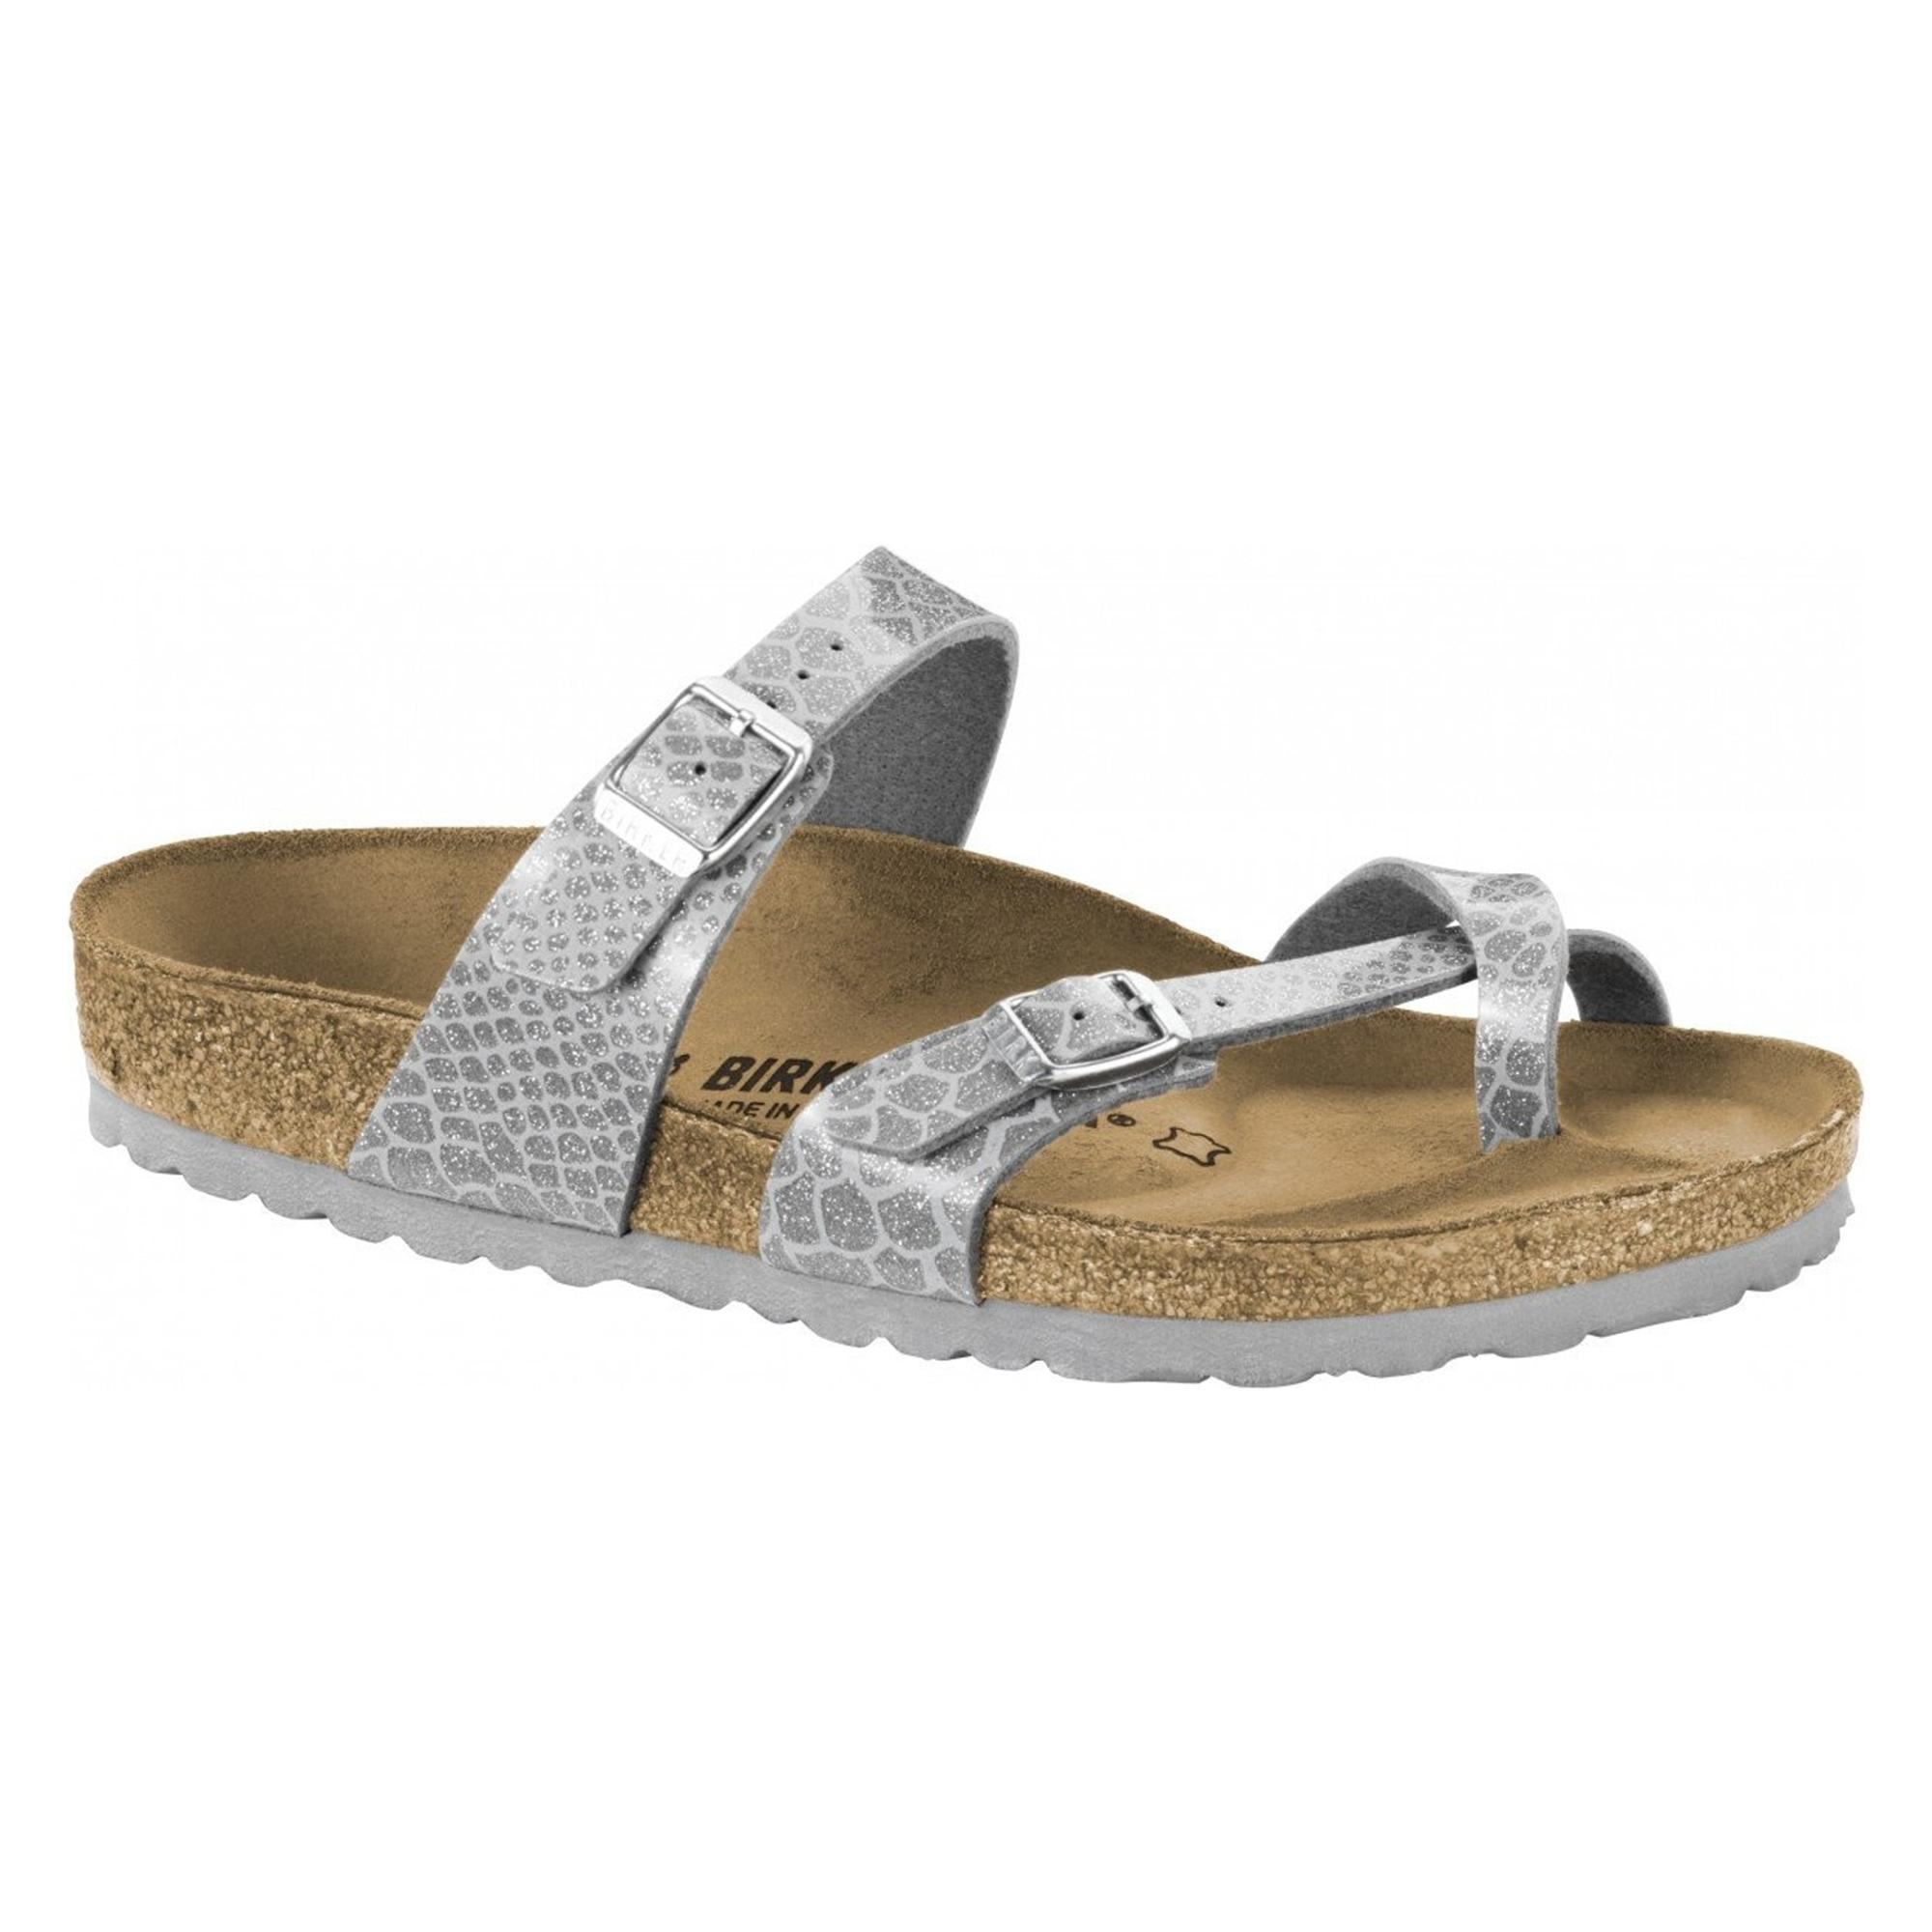 dcf567026a9 Birkenstock MAYARI 1009109 Ladies Cross Strap Sandals Snake Silver ...